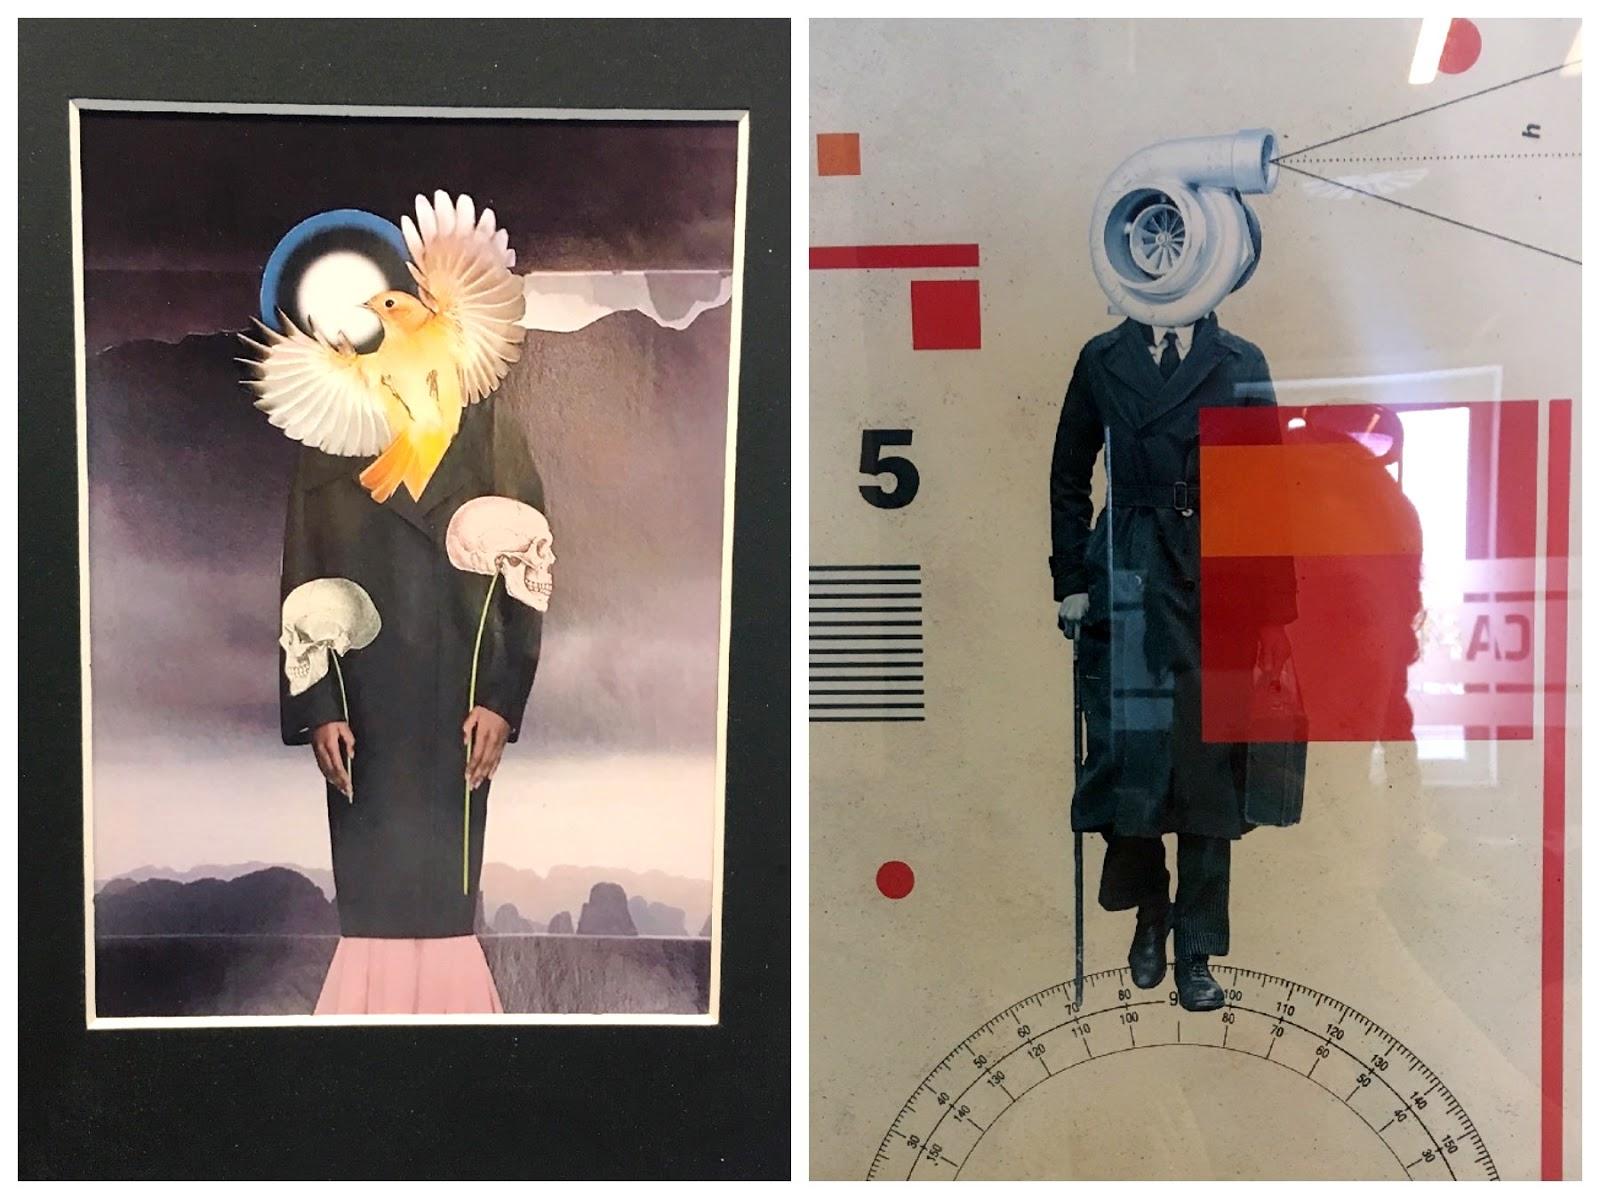 International Collage Art Exhibition by Retroavangarda 2019